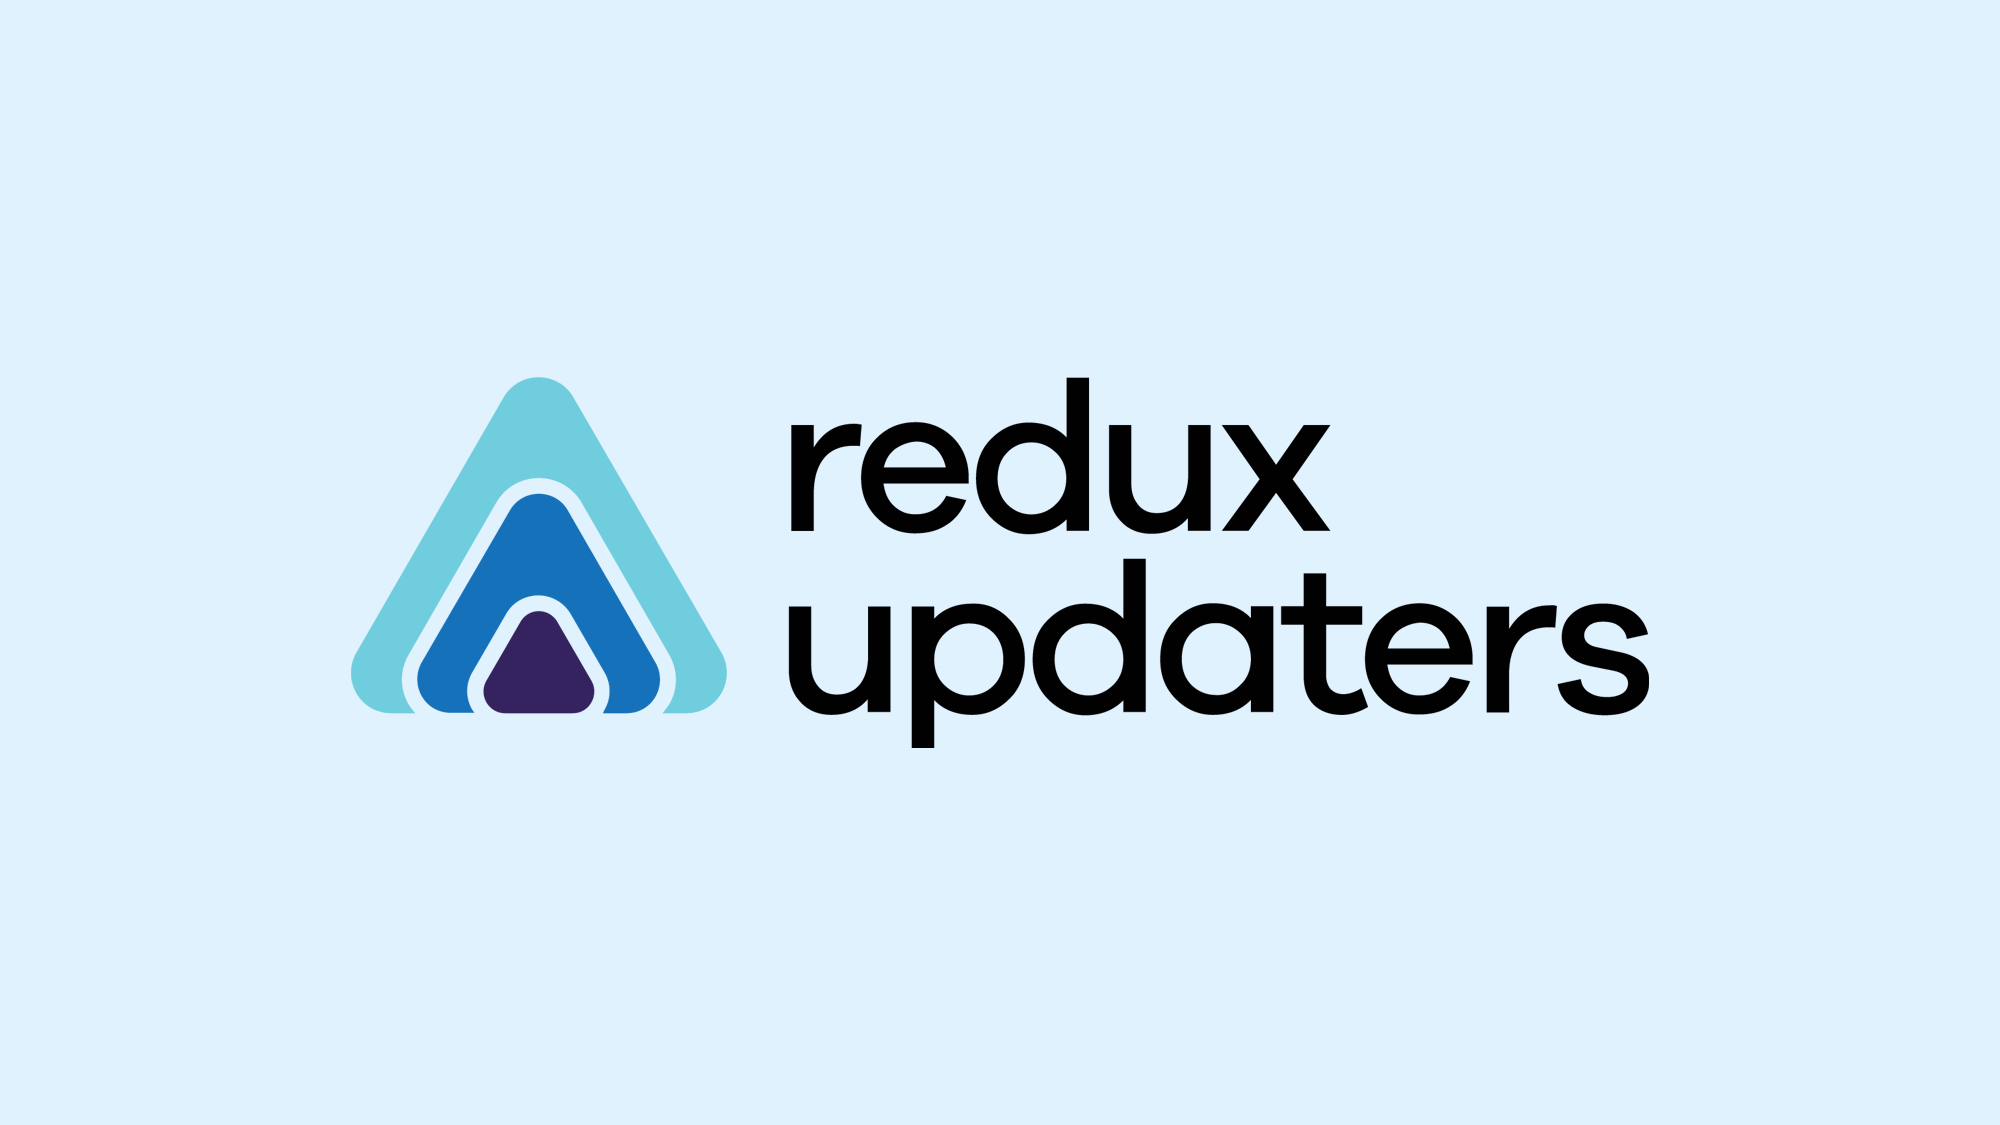 Redux updaters